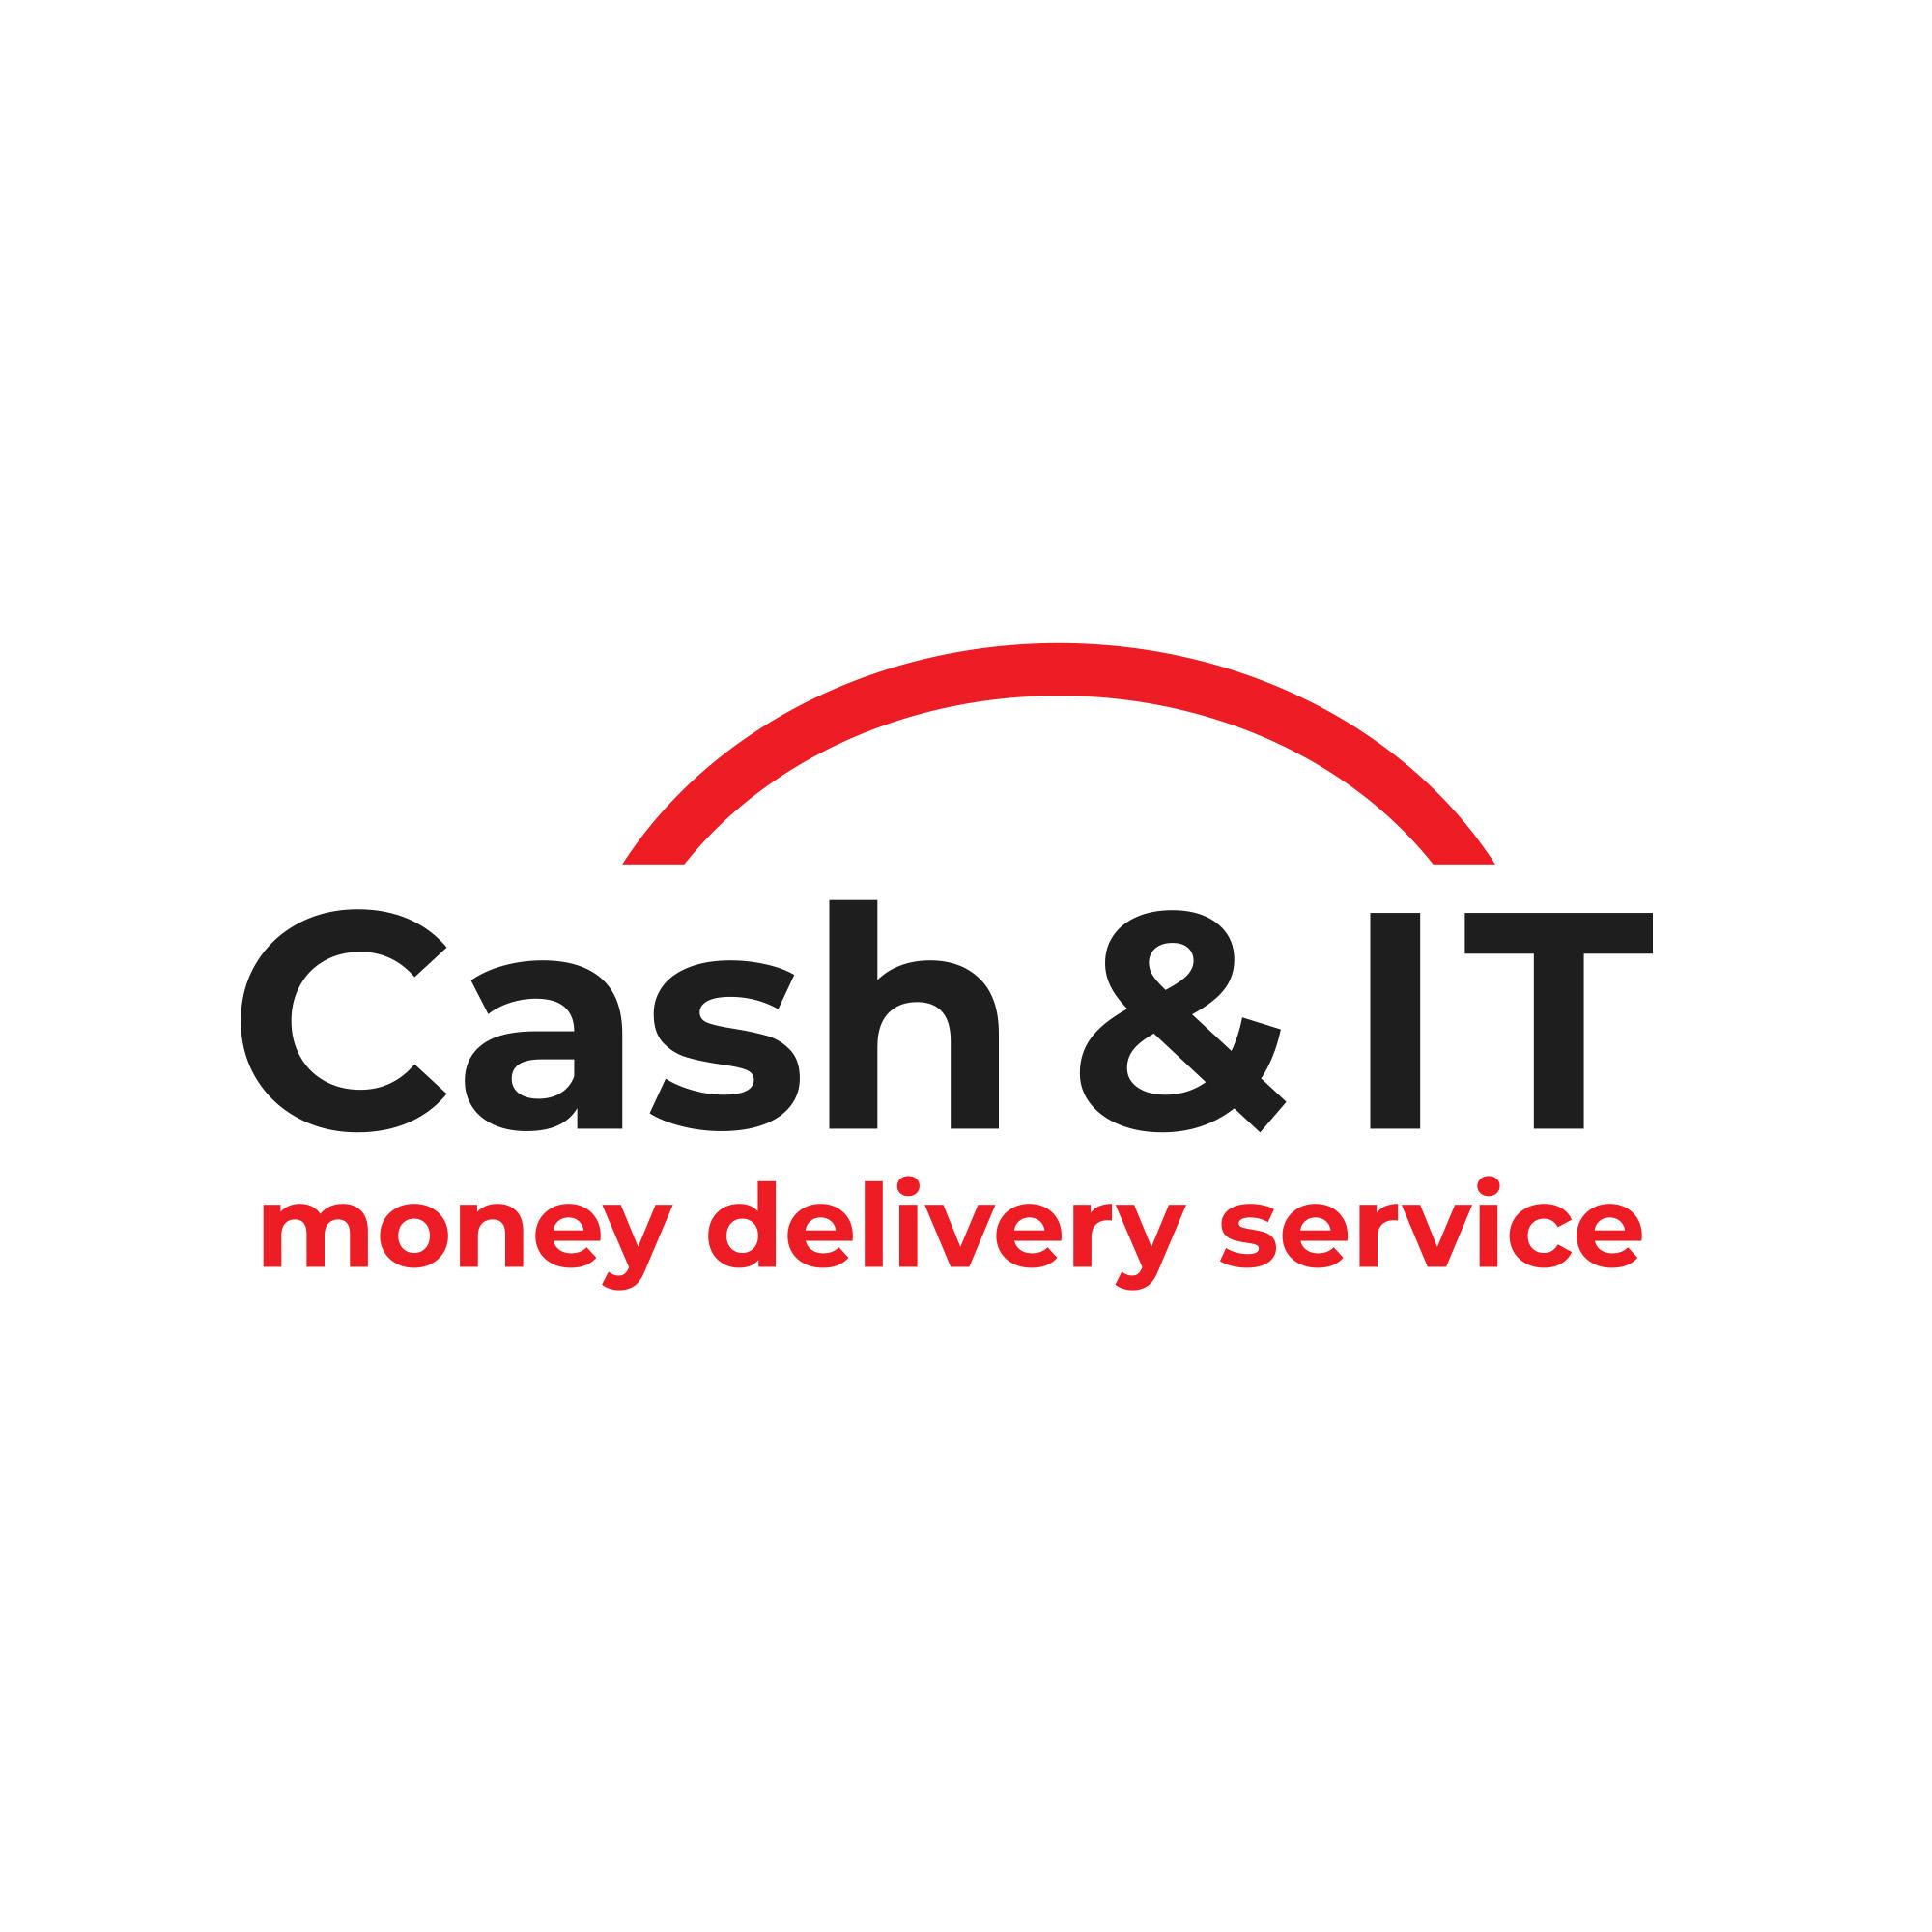 Логотип для Cash & IT - сервис доставки денег фото f_0715fe494753eae6.jpg